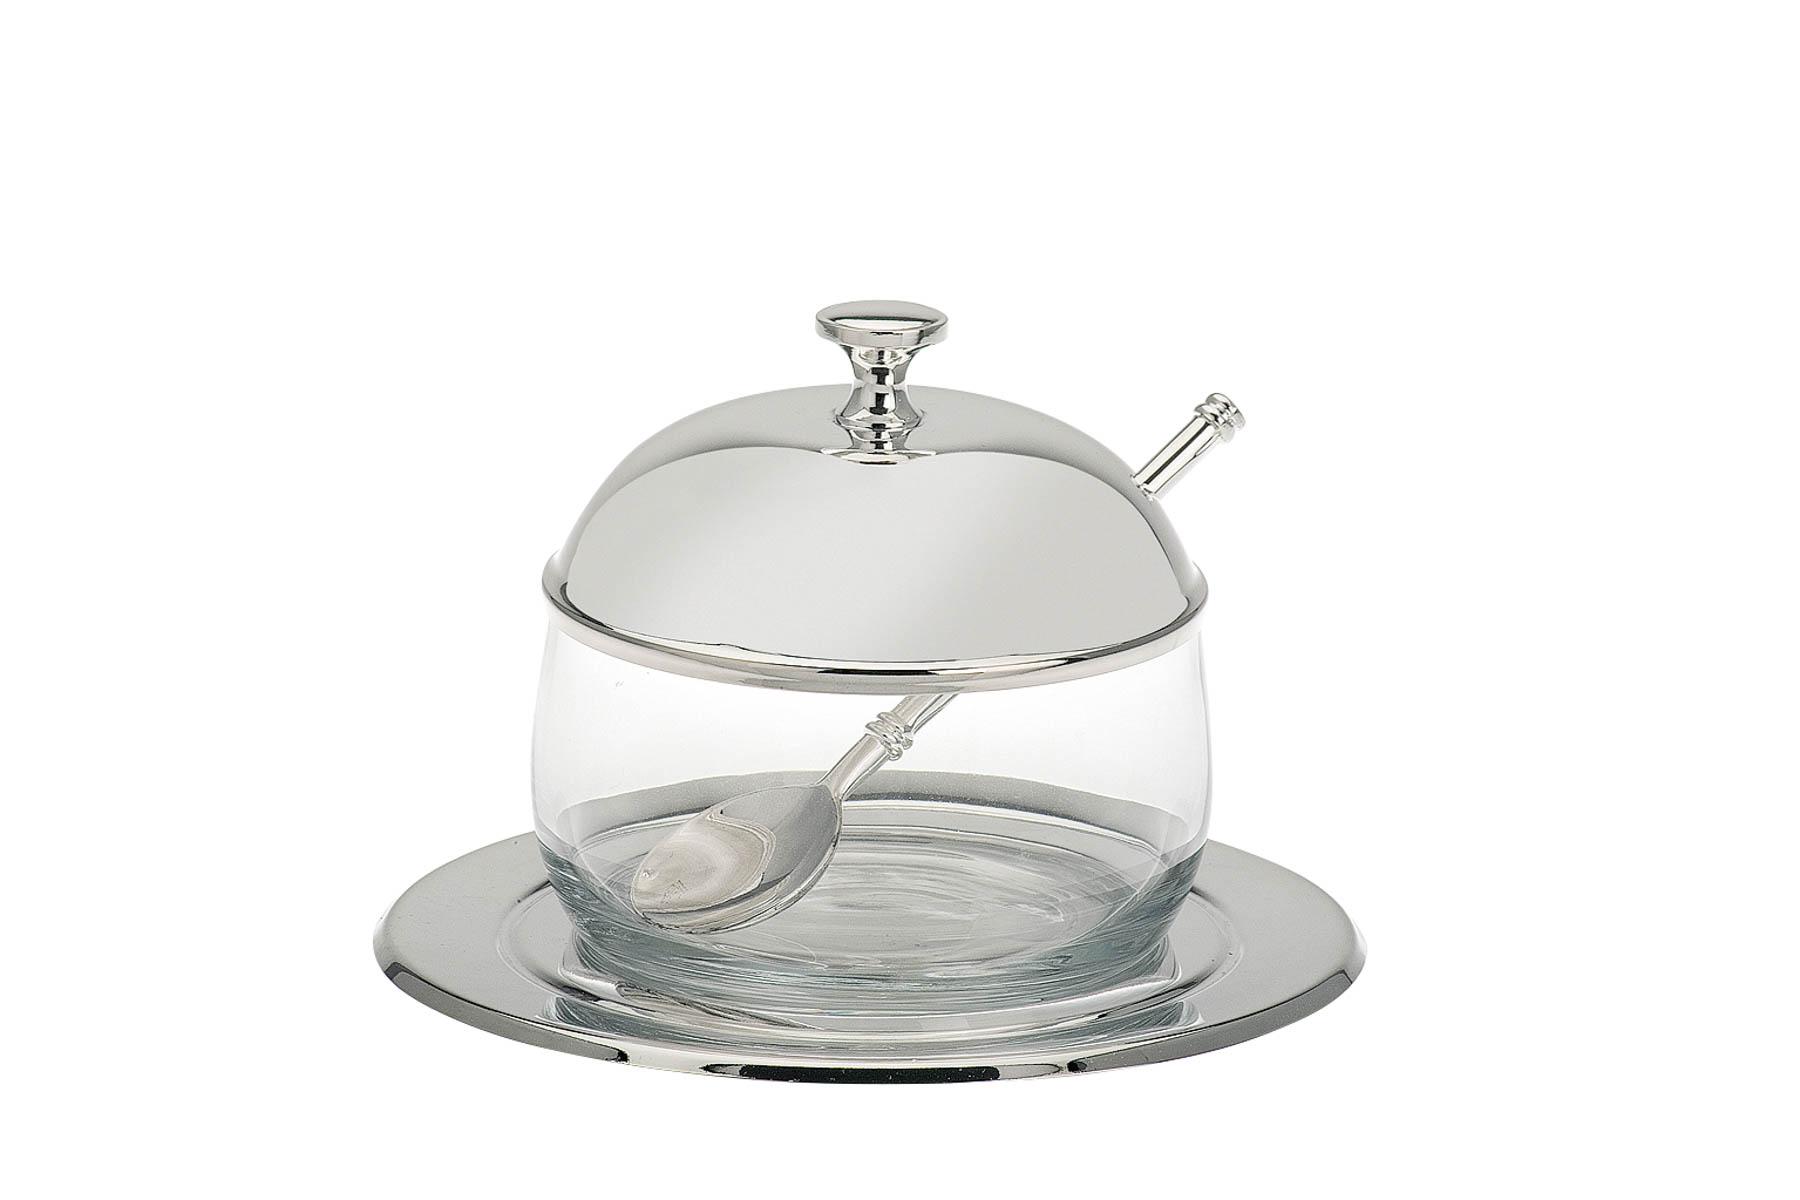 marmeladenglas mit l ffel versilbert online shop wirliebendeko. Black Bedroom Furniture Sets. Home Design Ideas